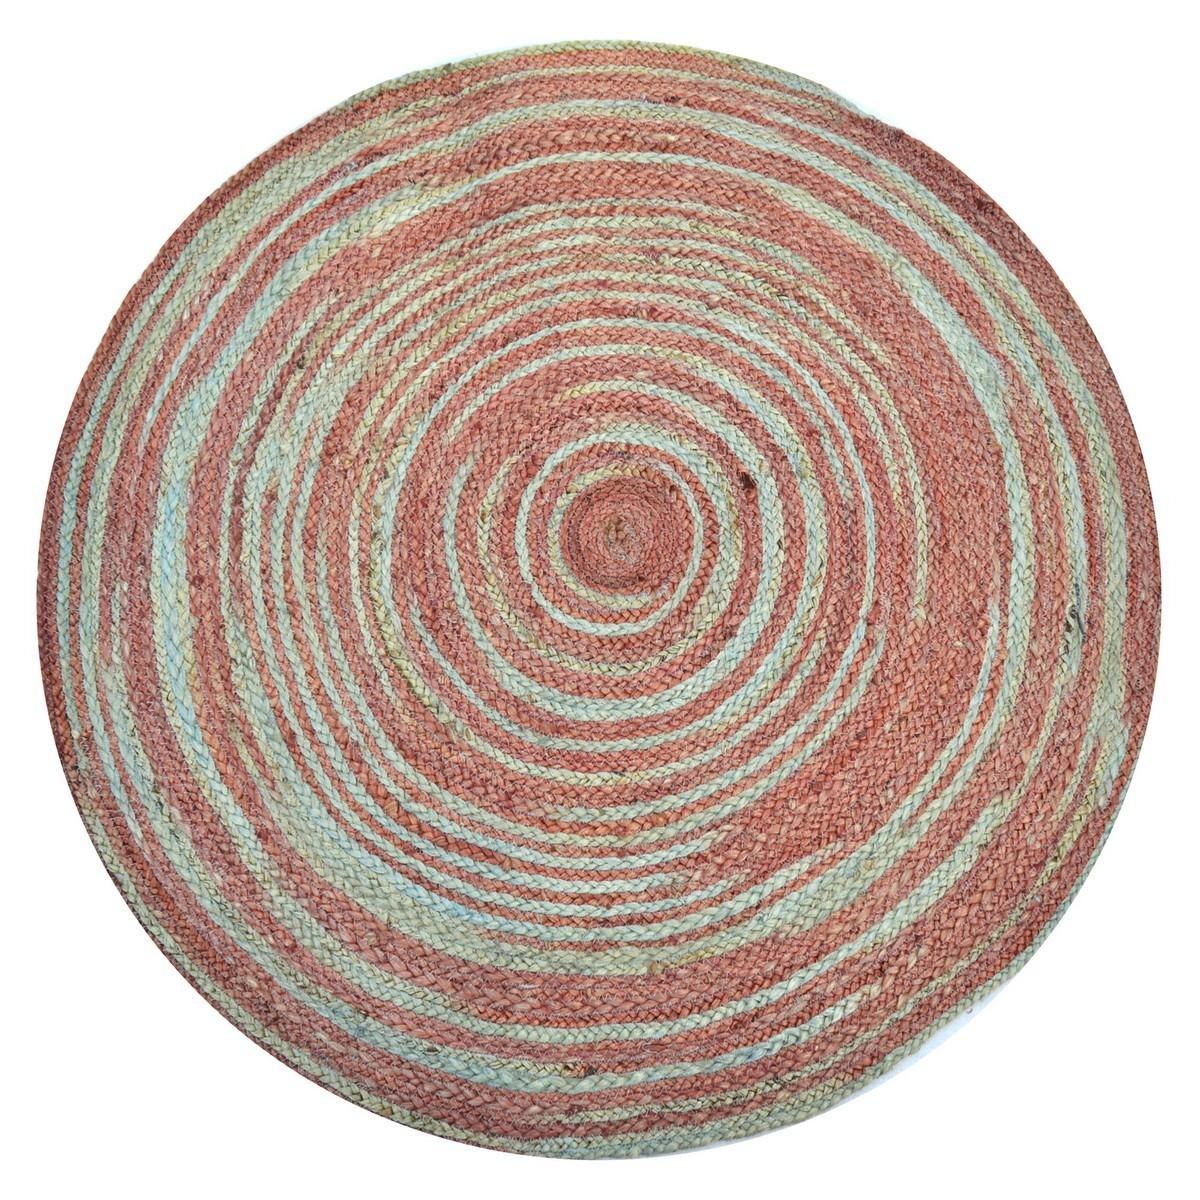 Kerla Spiral Handwoven Round Jute Rug, 100cm, Aqua / Rose